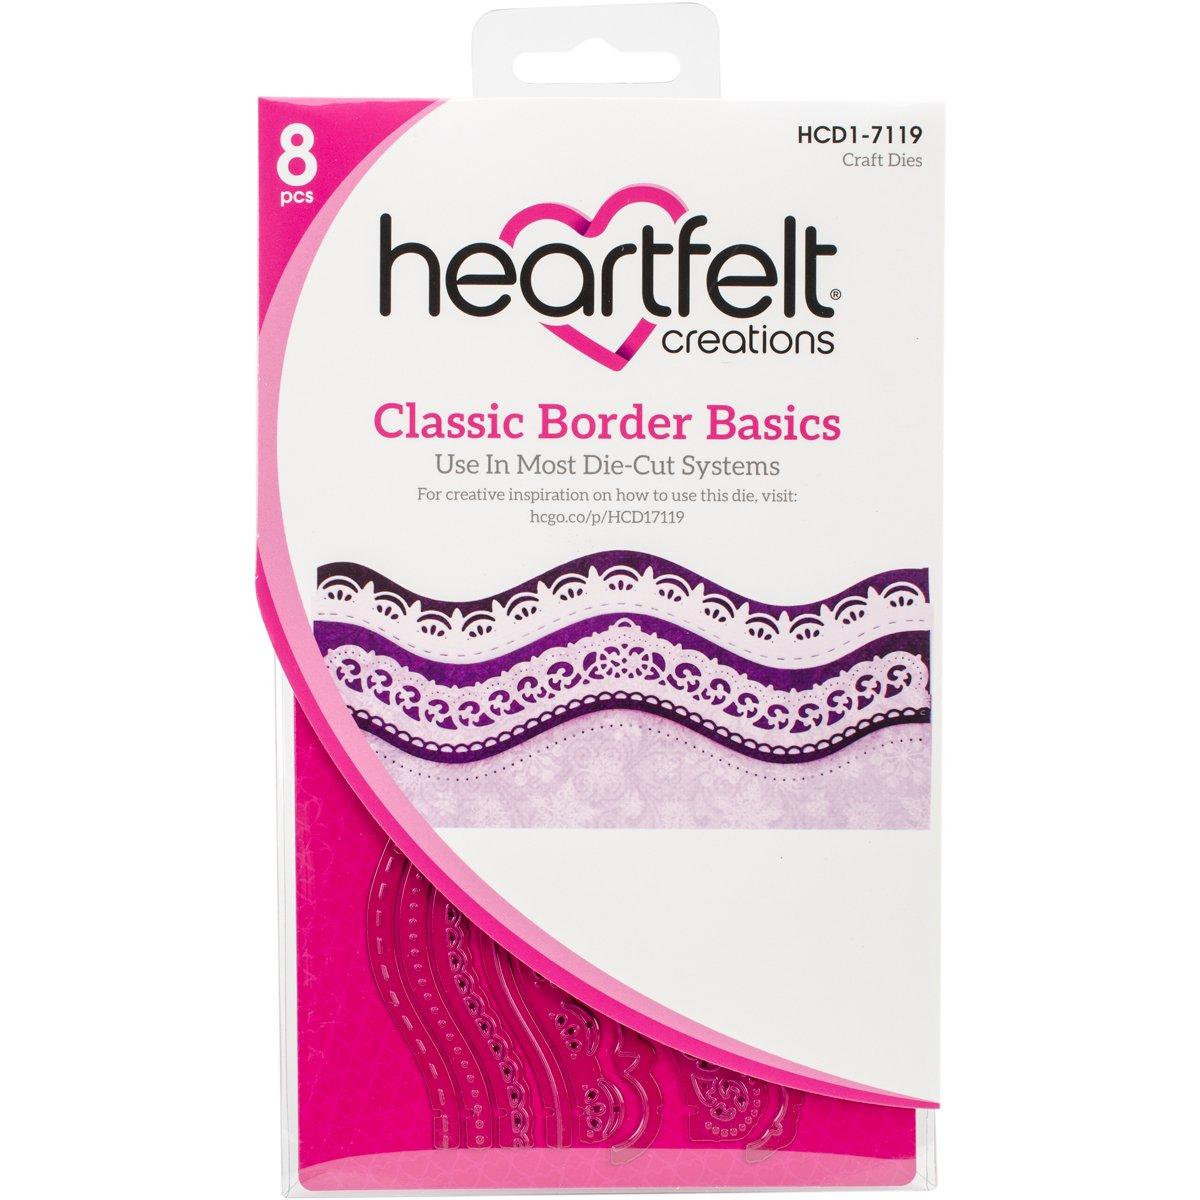 Heartfelt Creations Classic Border Basics .25'' to 7'' Emboss Dies